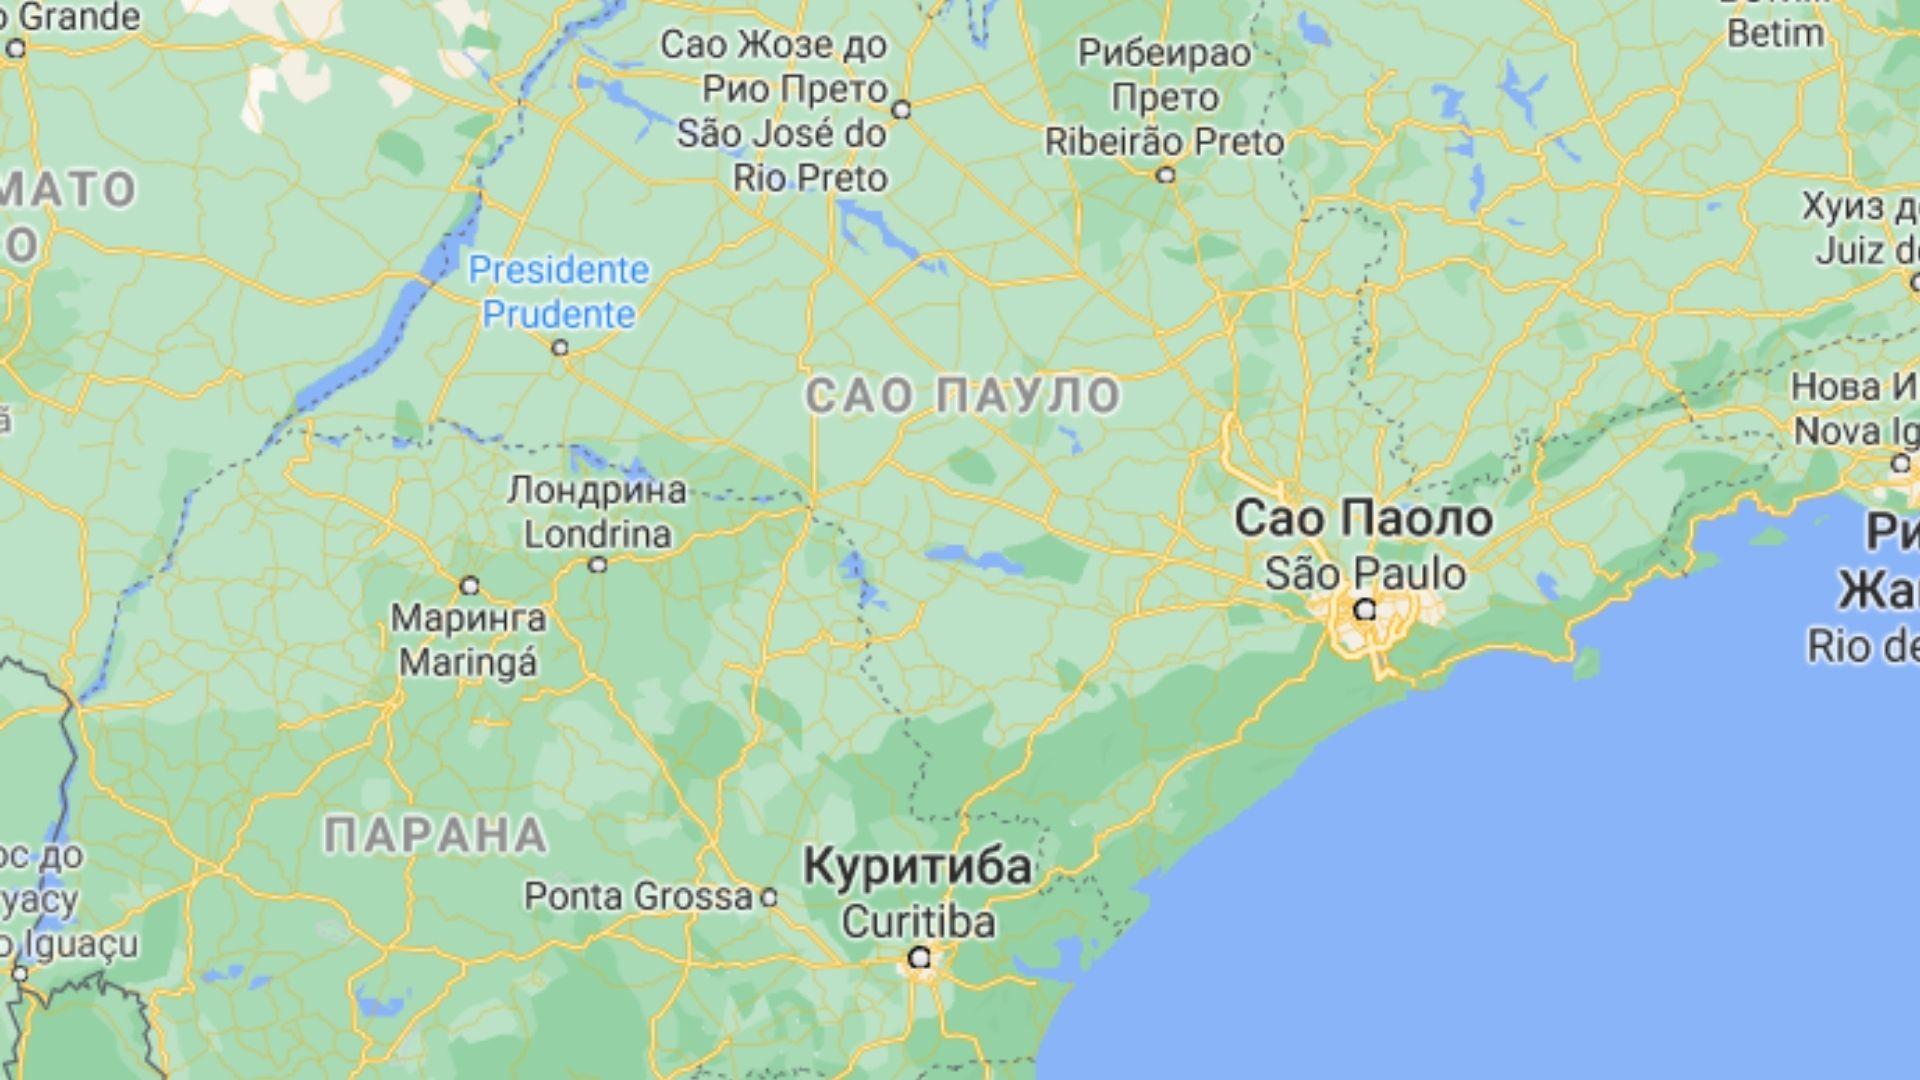 agaricus blazei lekovita gljiva iz brazila anti kancer mapa